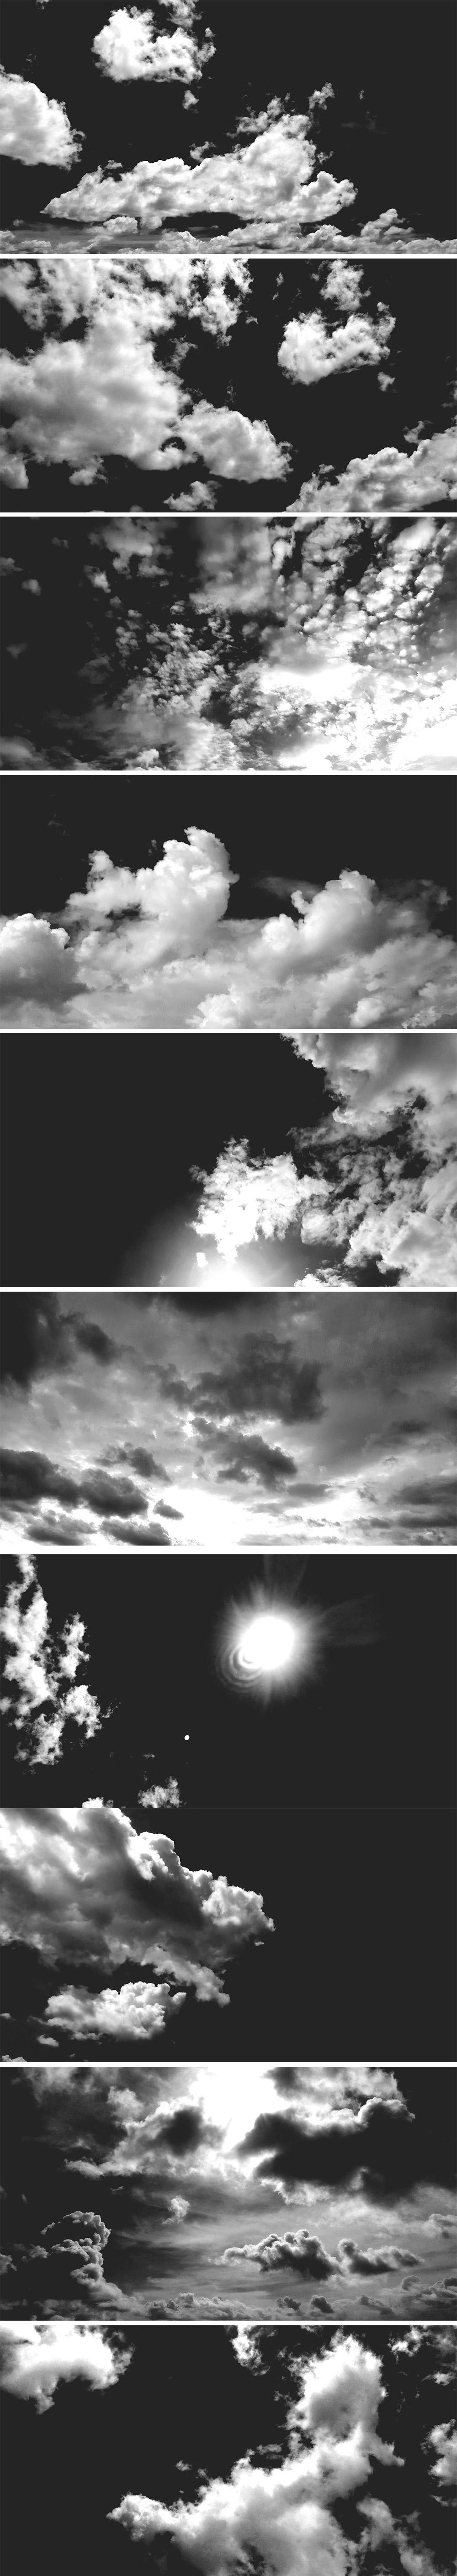 Free Black & White Skies